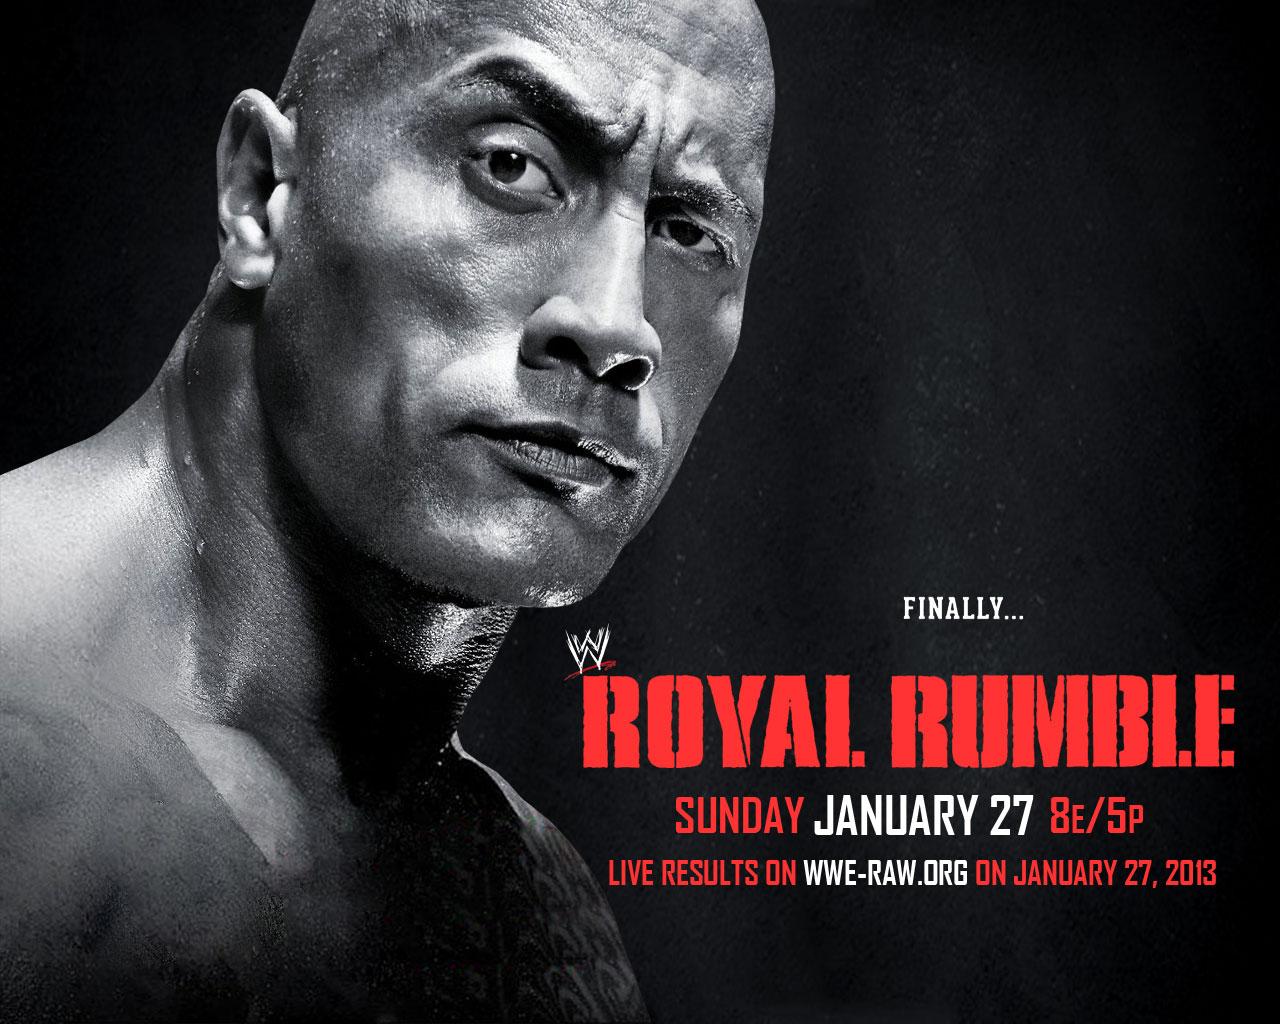 http://ziedrich.files.wordpress.com/2013/01/royal-rumble-2013-logo.jpg